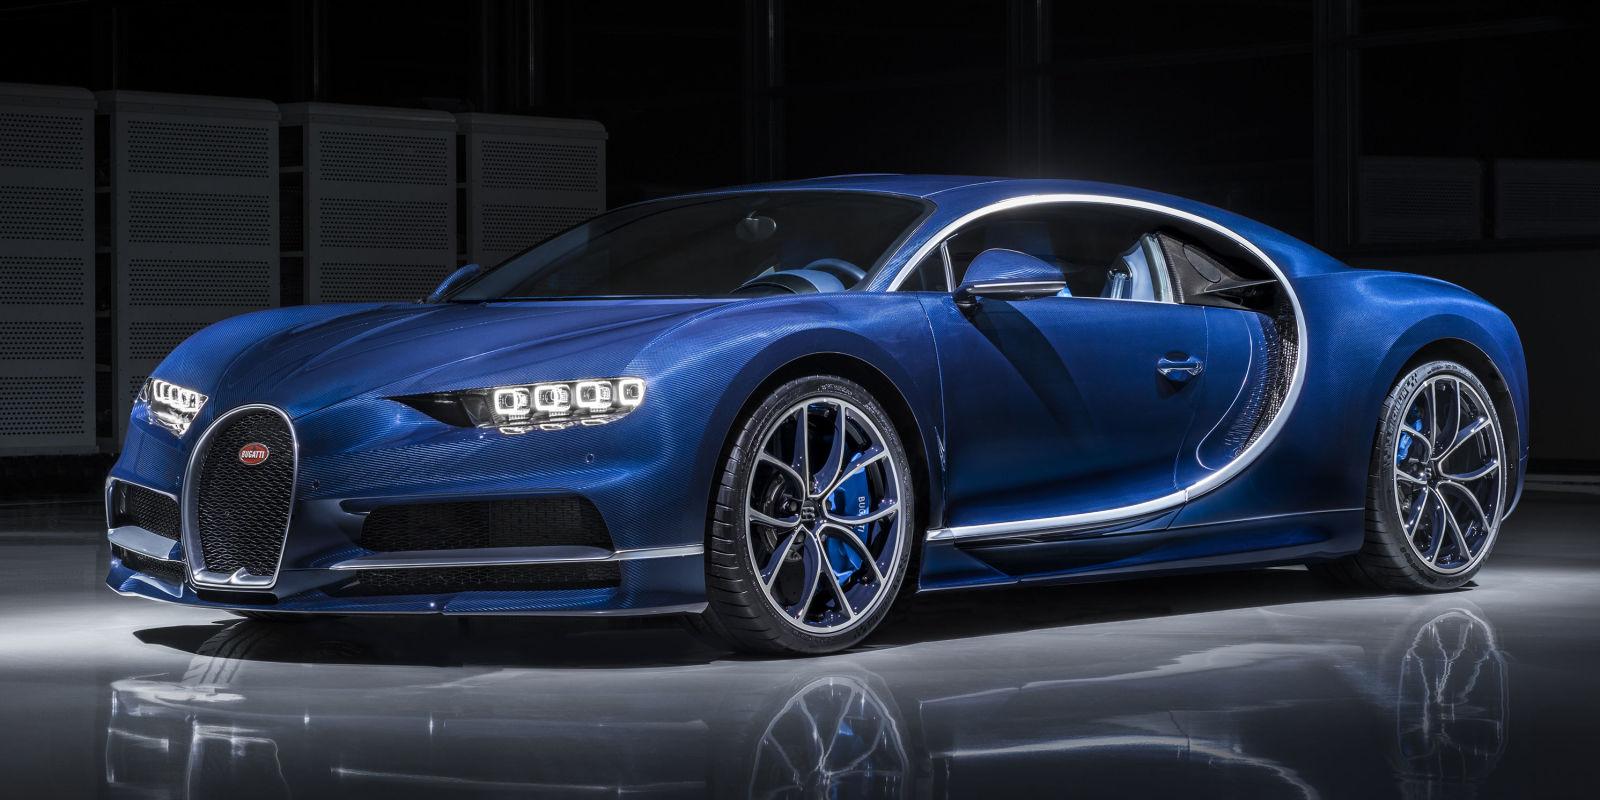 Bugatti Chiron Speed Limited by Tire Technology - VWVortex